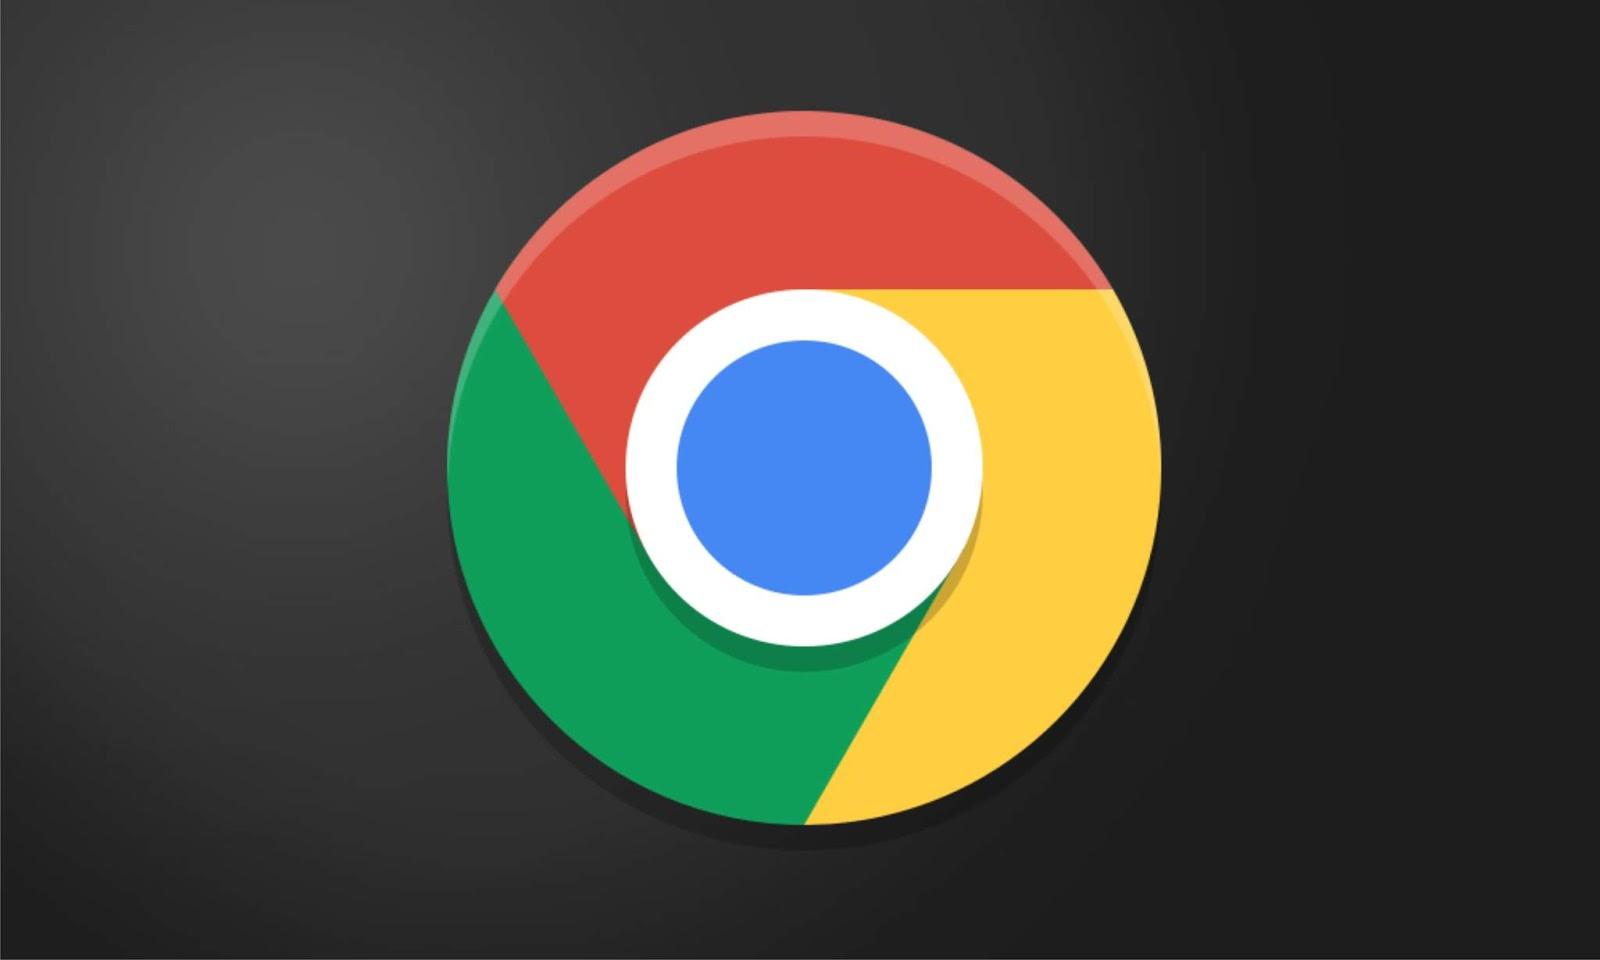 Aplikasi Browser Android Pengganti Google Chrome - VexaGame